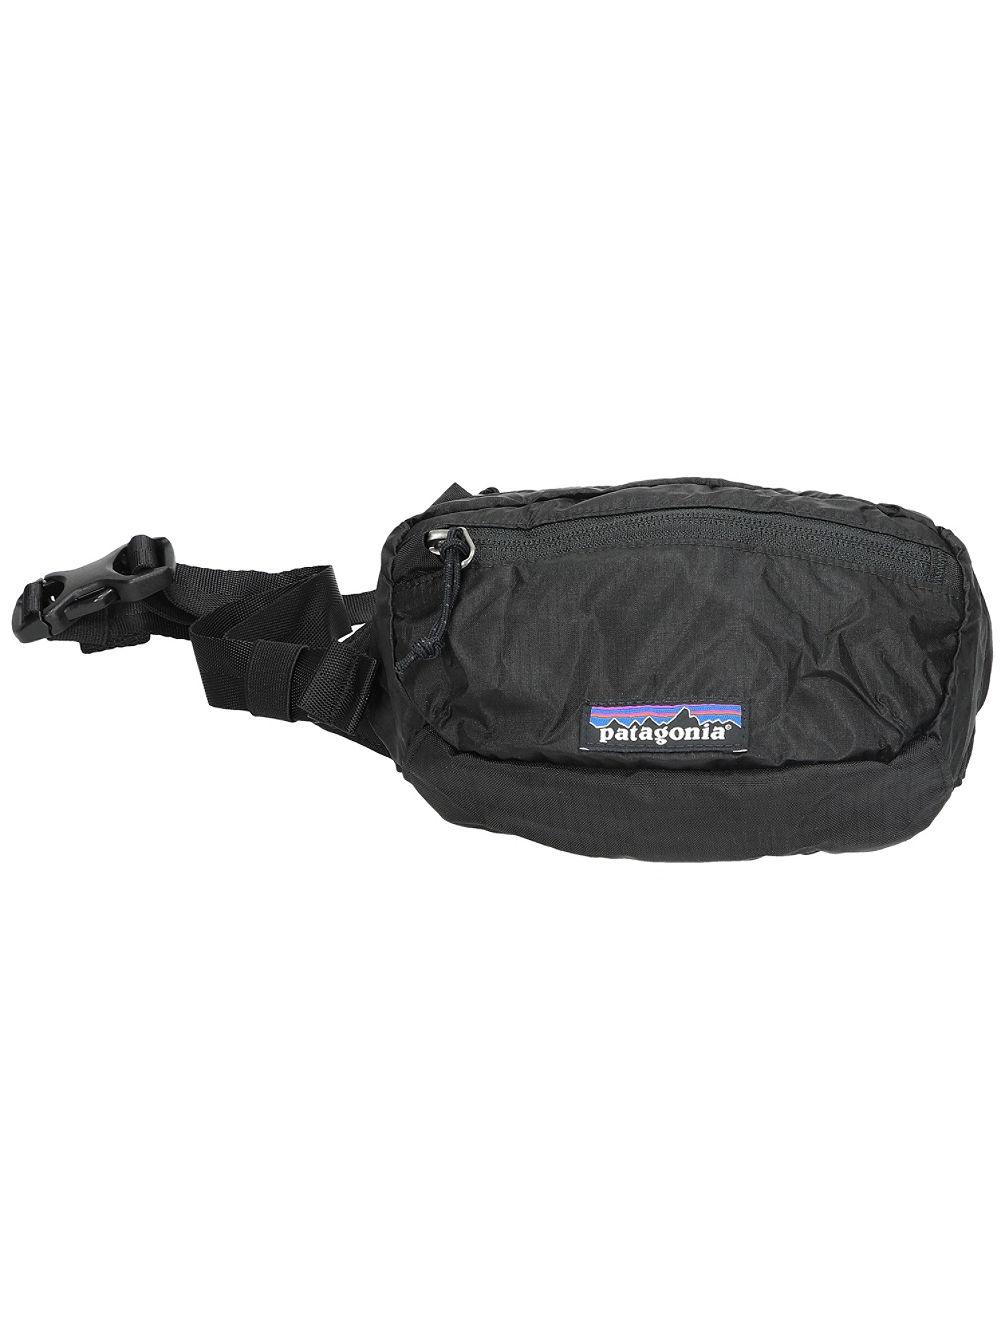 bb9f1d133469 Buy Patagonia LW Travel Mini Hip Bag online at blue-tomato.com